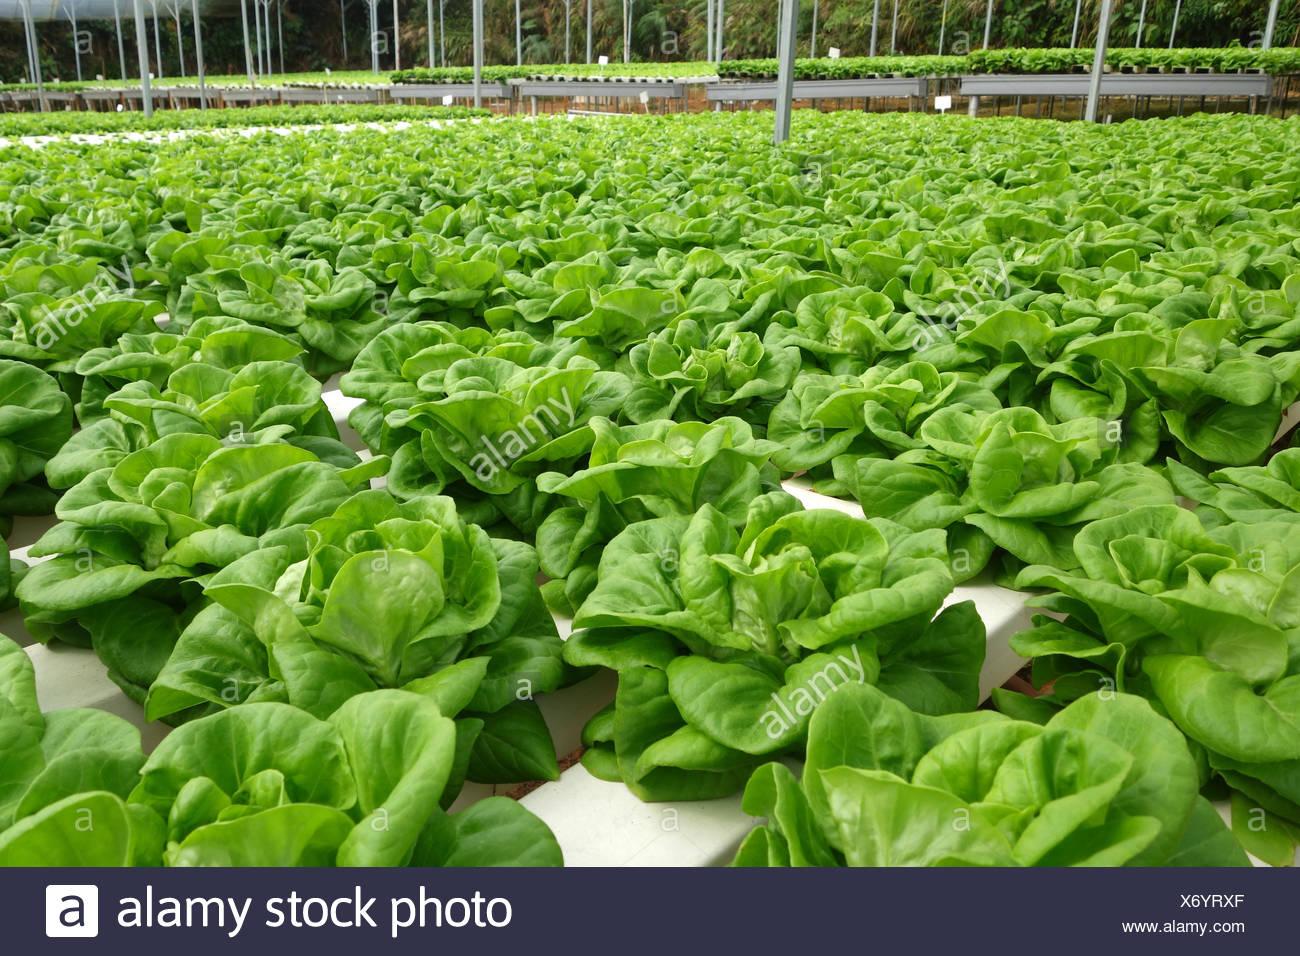 Serre commerciale culture hors-sol de légumes Banque D'Images